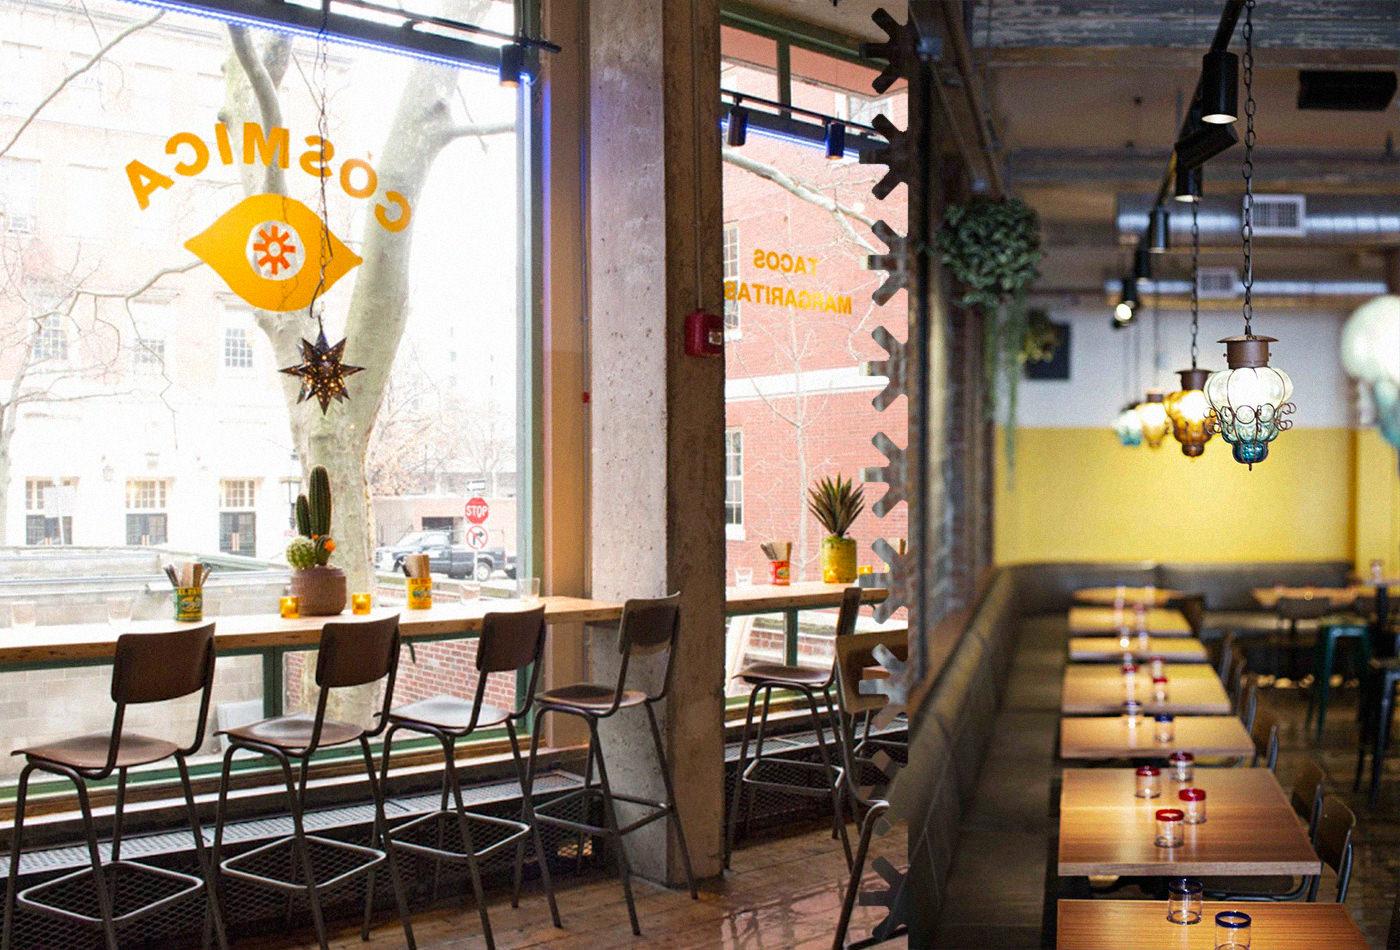 cosmica-cosmicaboston-boston-thebeehive-jackbardy-vacaliebres-branding-mexican-mexico-taco-tacos-cla-mex-logo-branding-restaurant